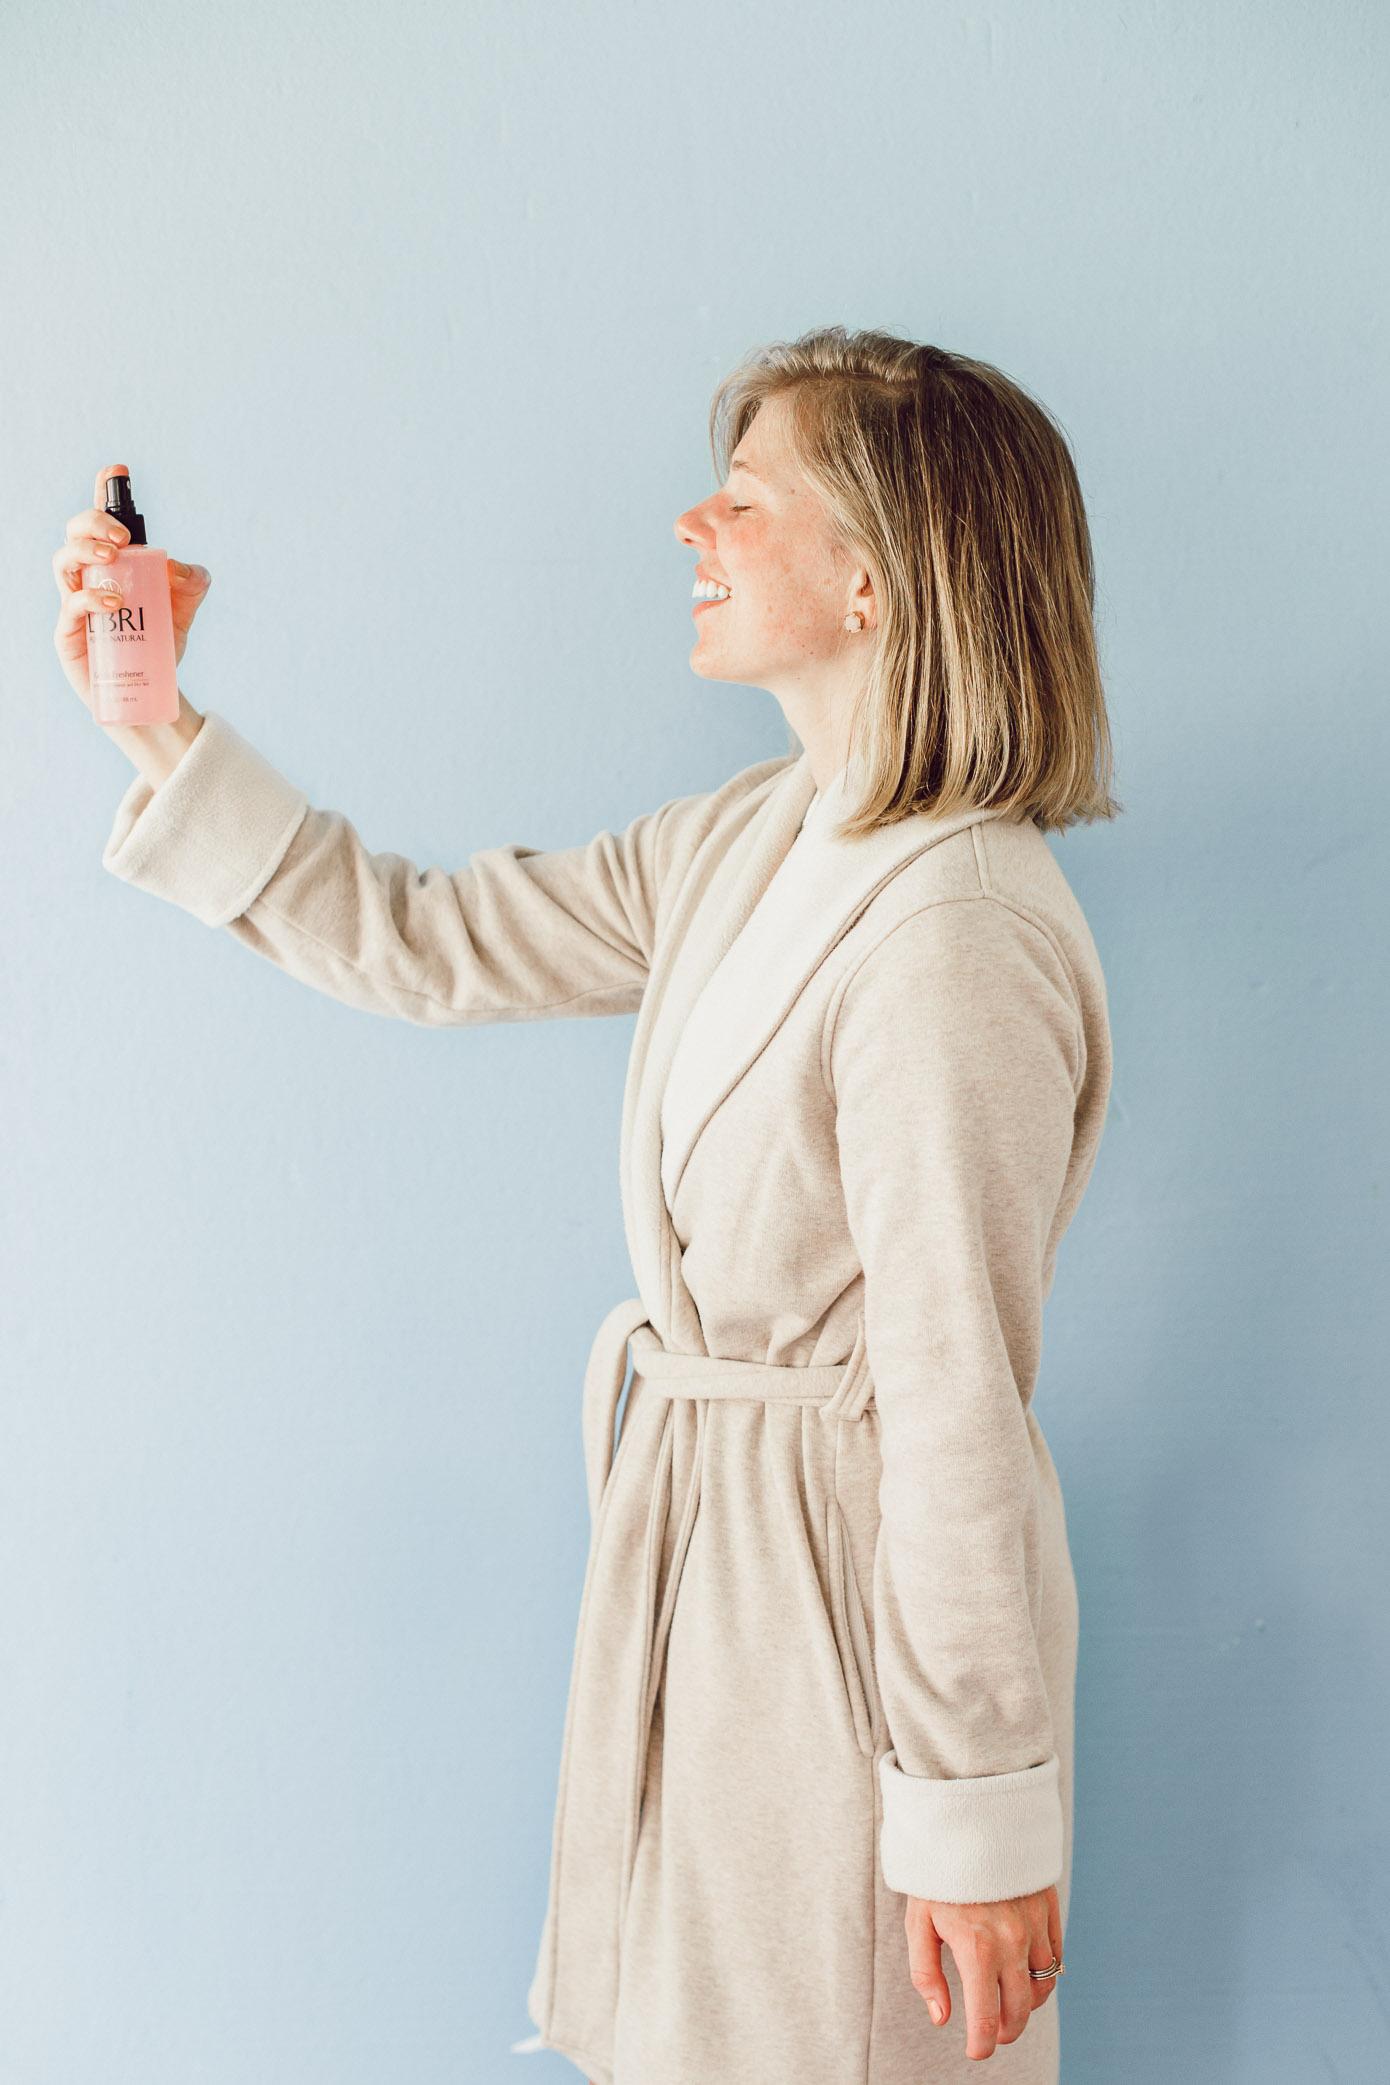 Clean Beauty Fresheners | Clean Beauty Facial Sprays | Louella Reese